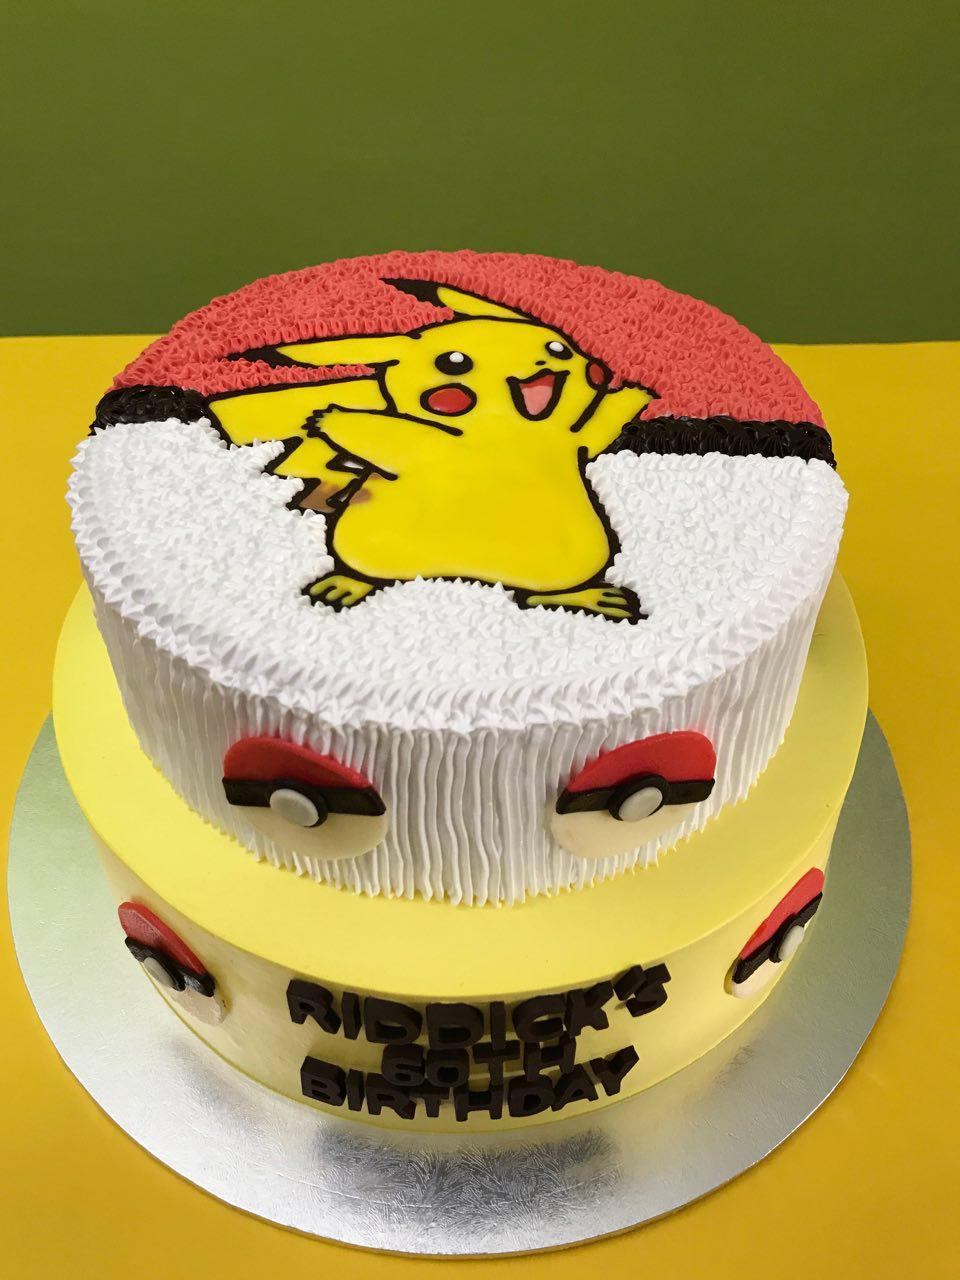 2-tier Pikachu with Pokeballs